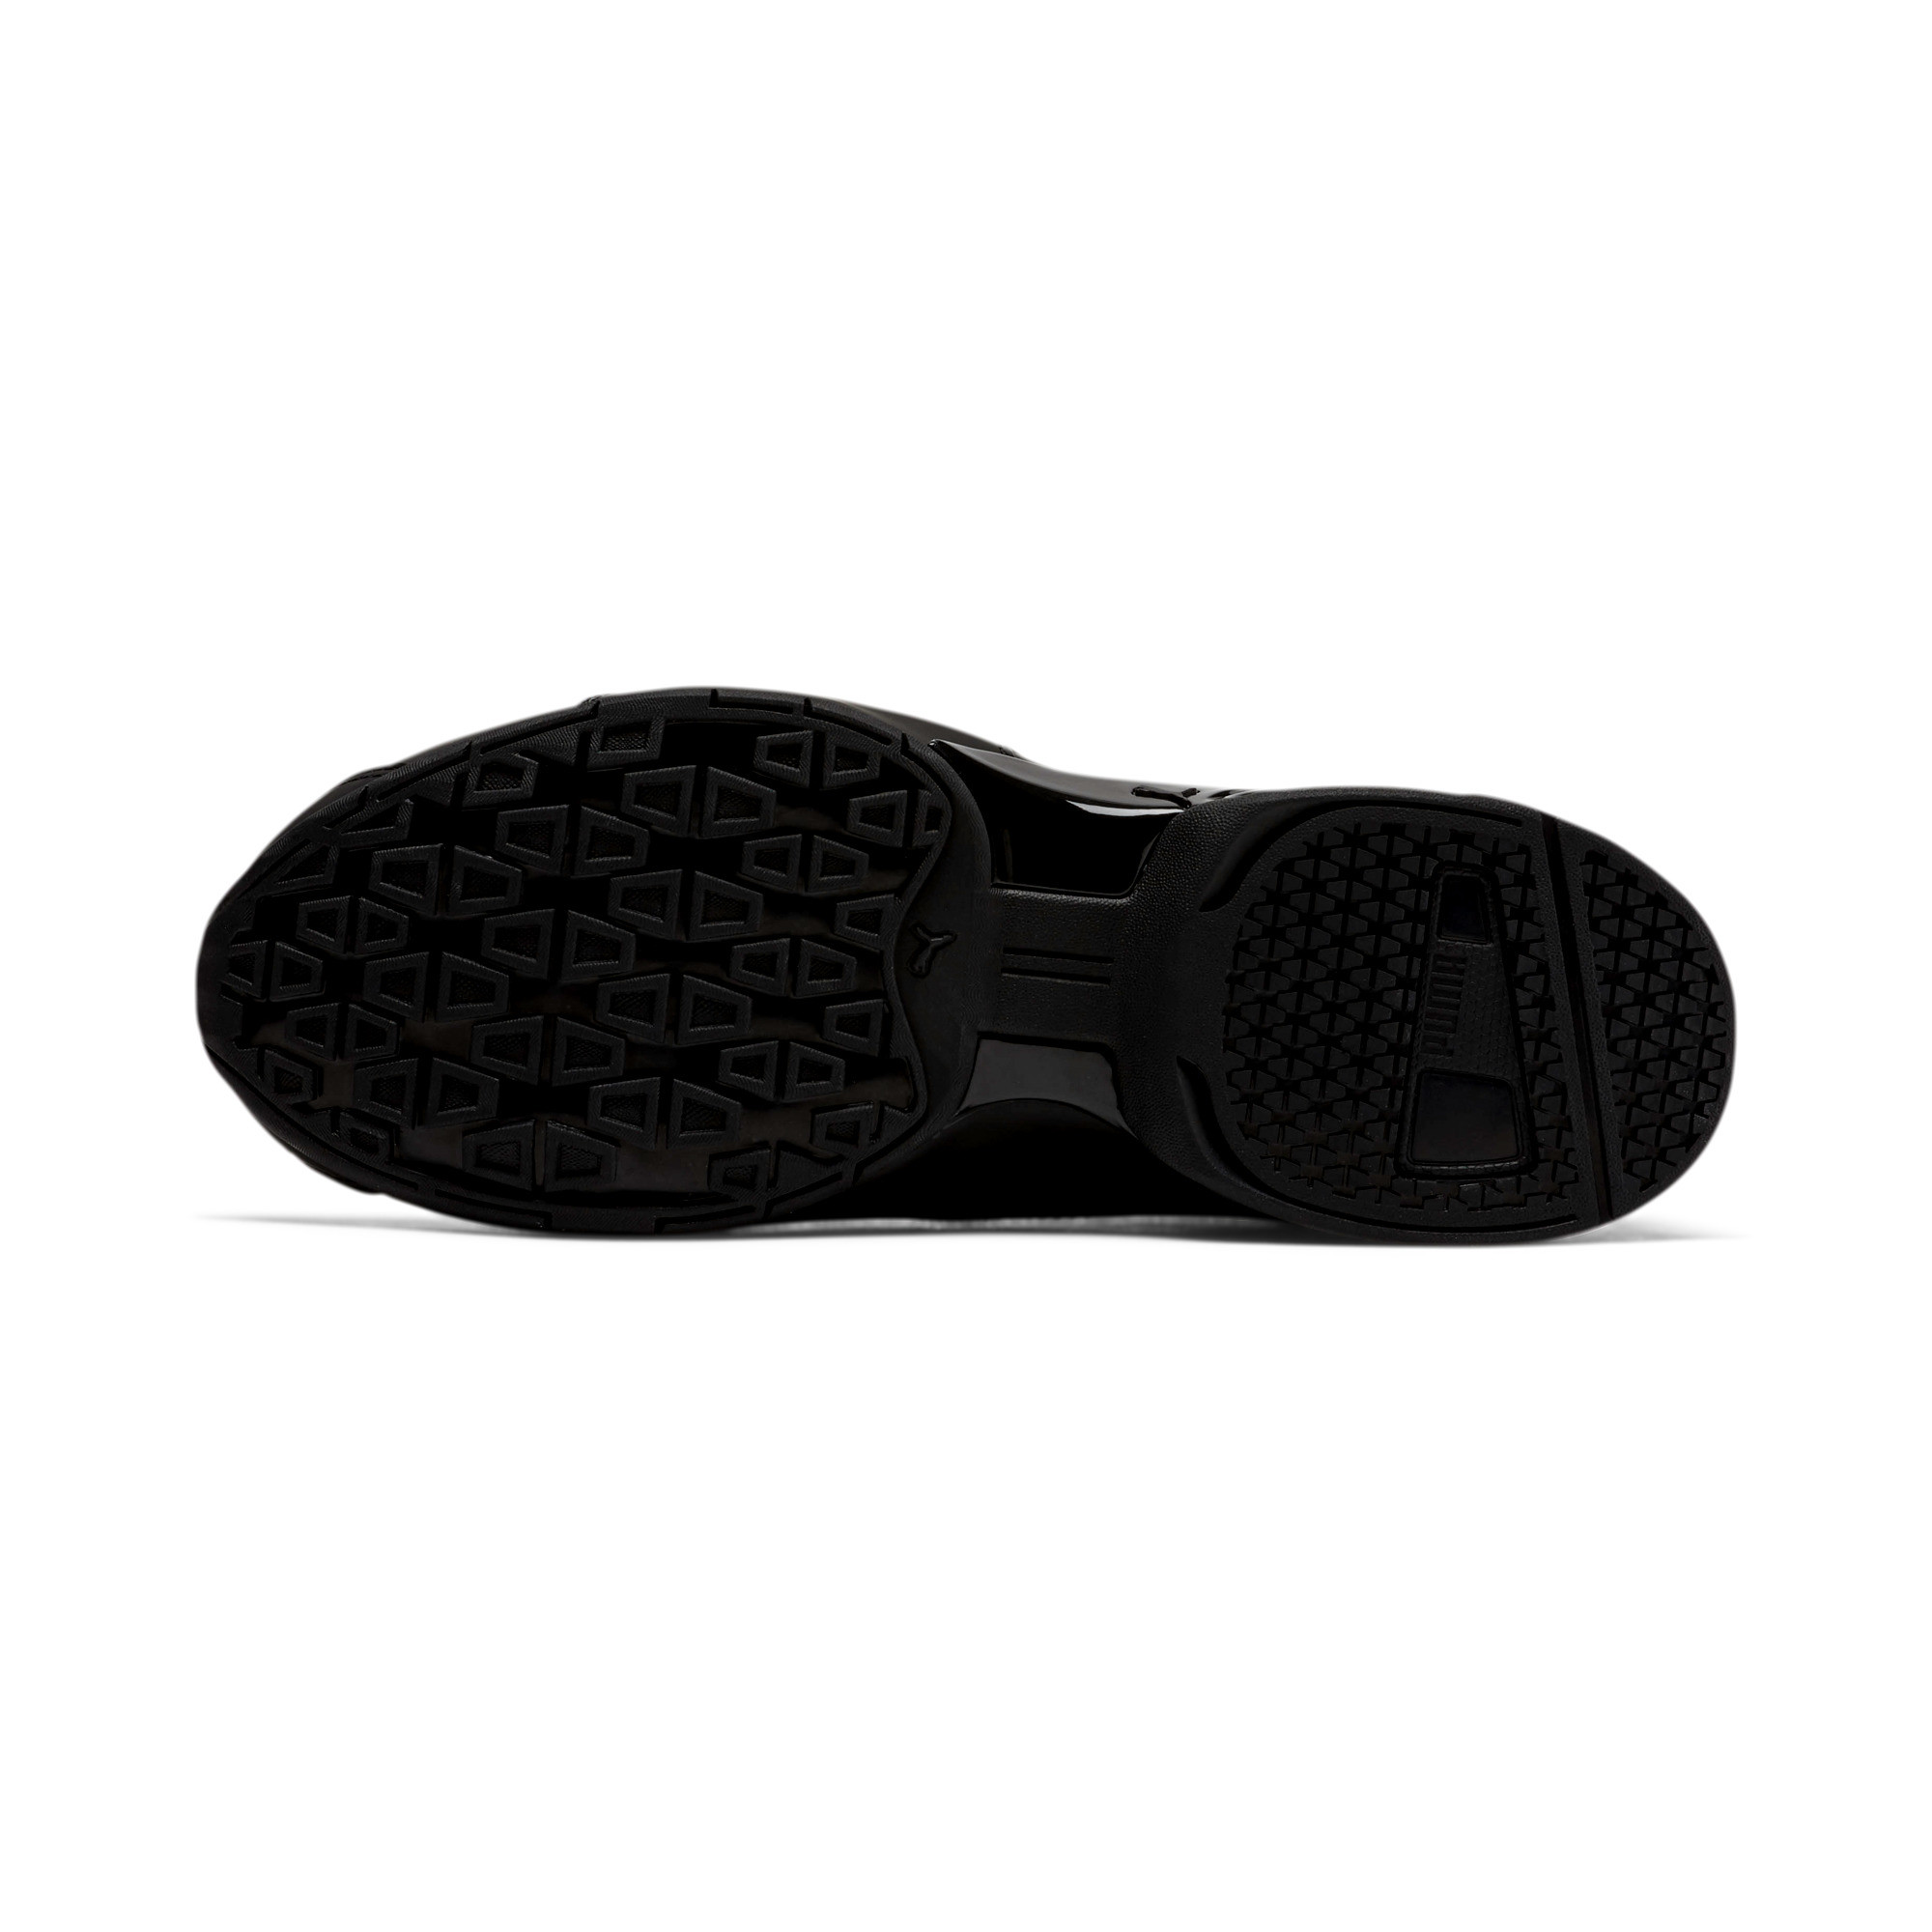 PUMA-Men-039-s-Tazon-6-Fracture-FM-Wide-Sneakers miniatura 10